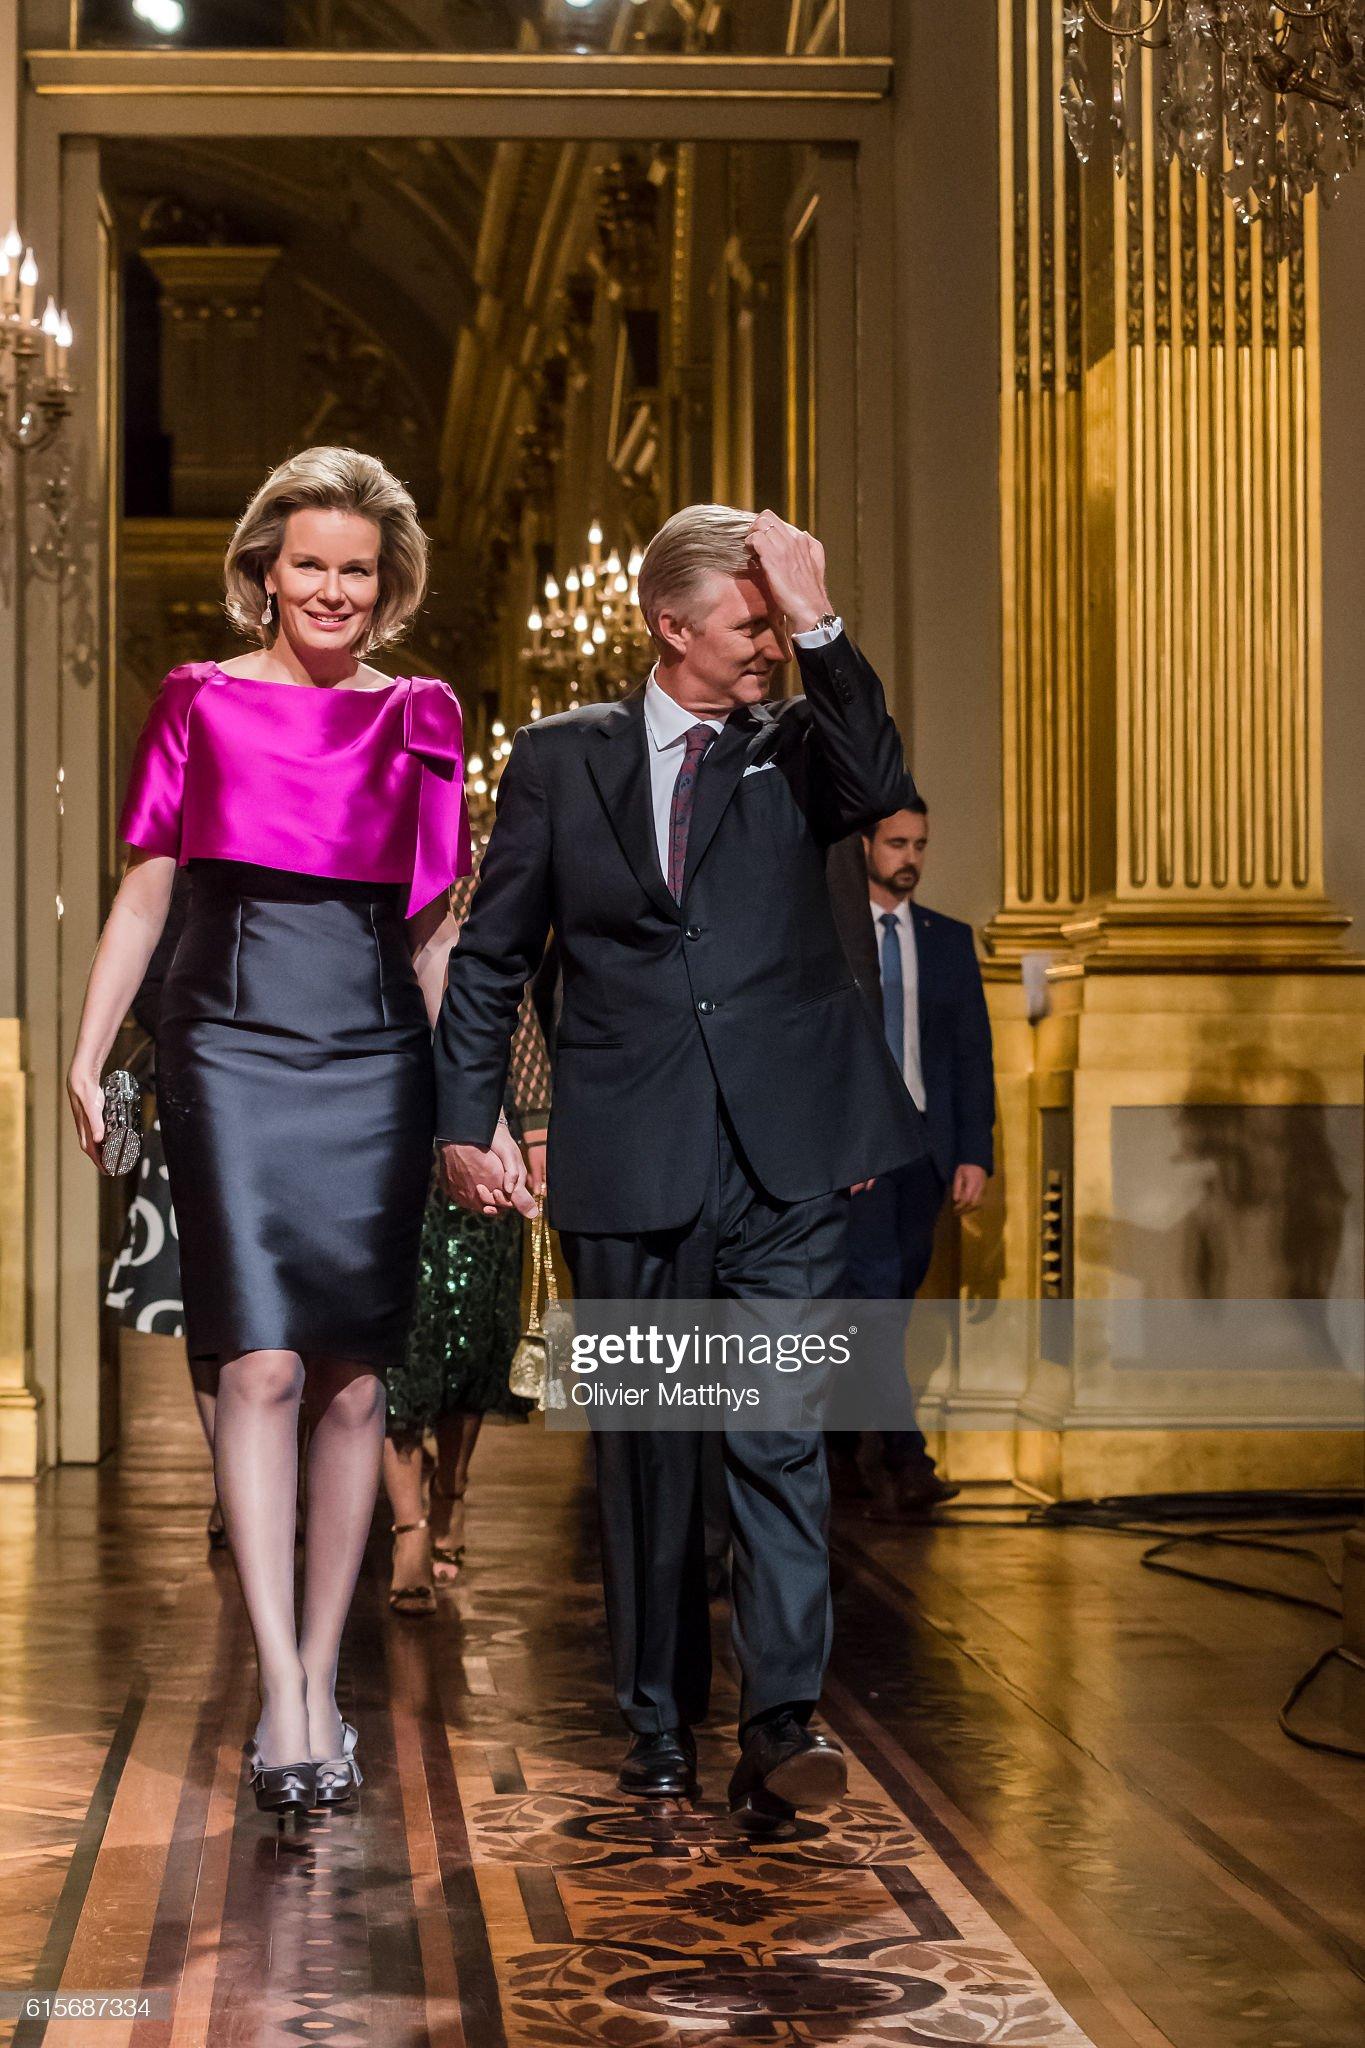 Вечерние наряды Королевы Матильды 'Autumn Concert 2016' At The Royal Palace In Brussels : News Photo